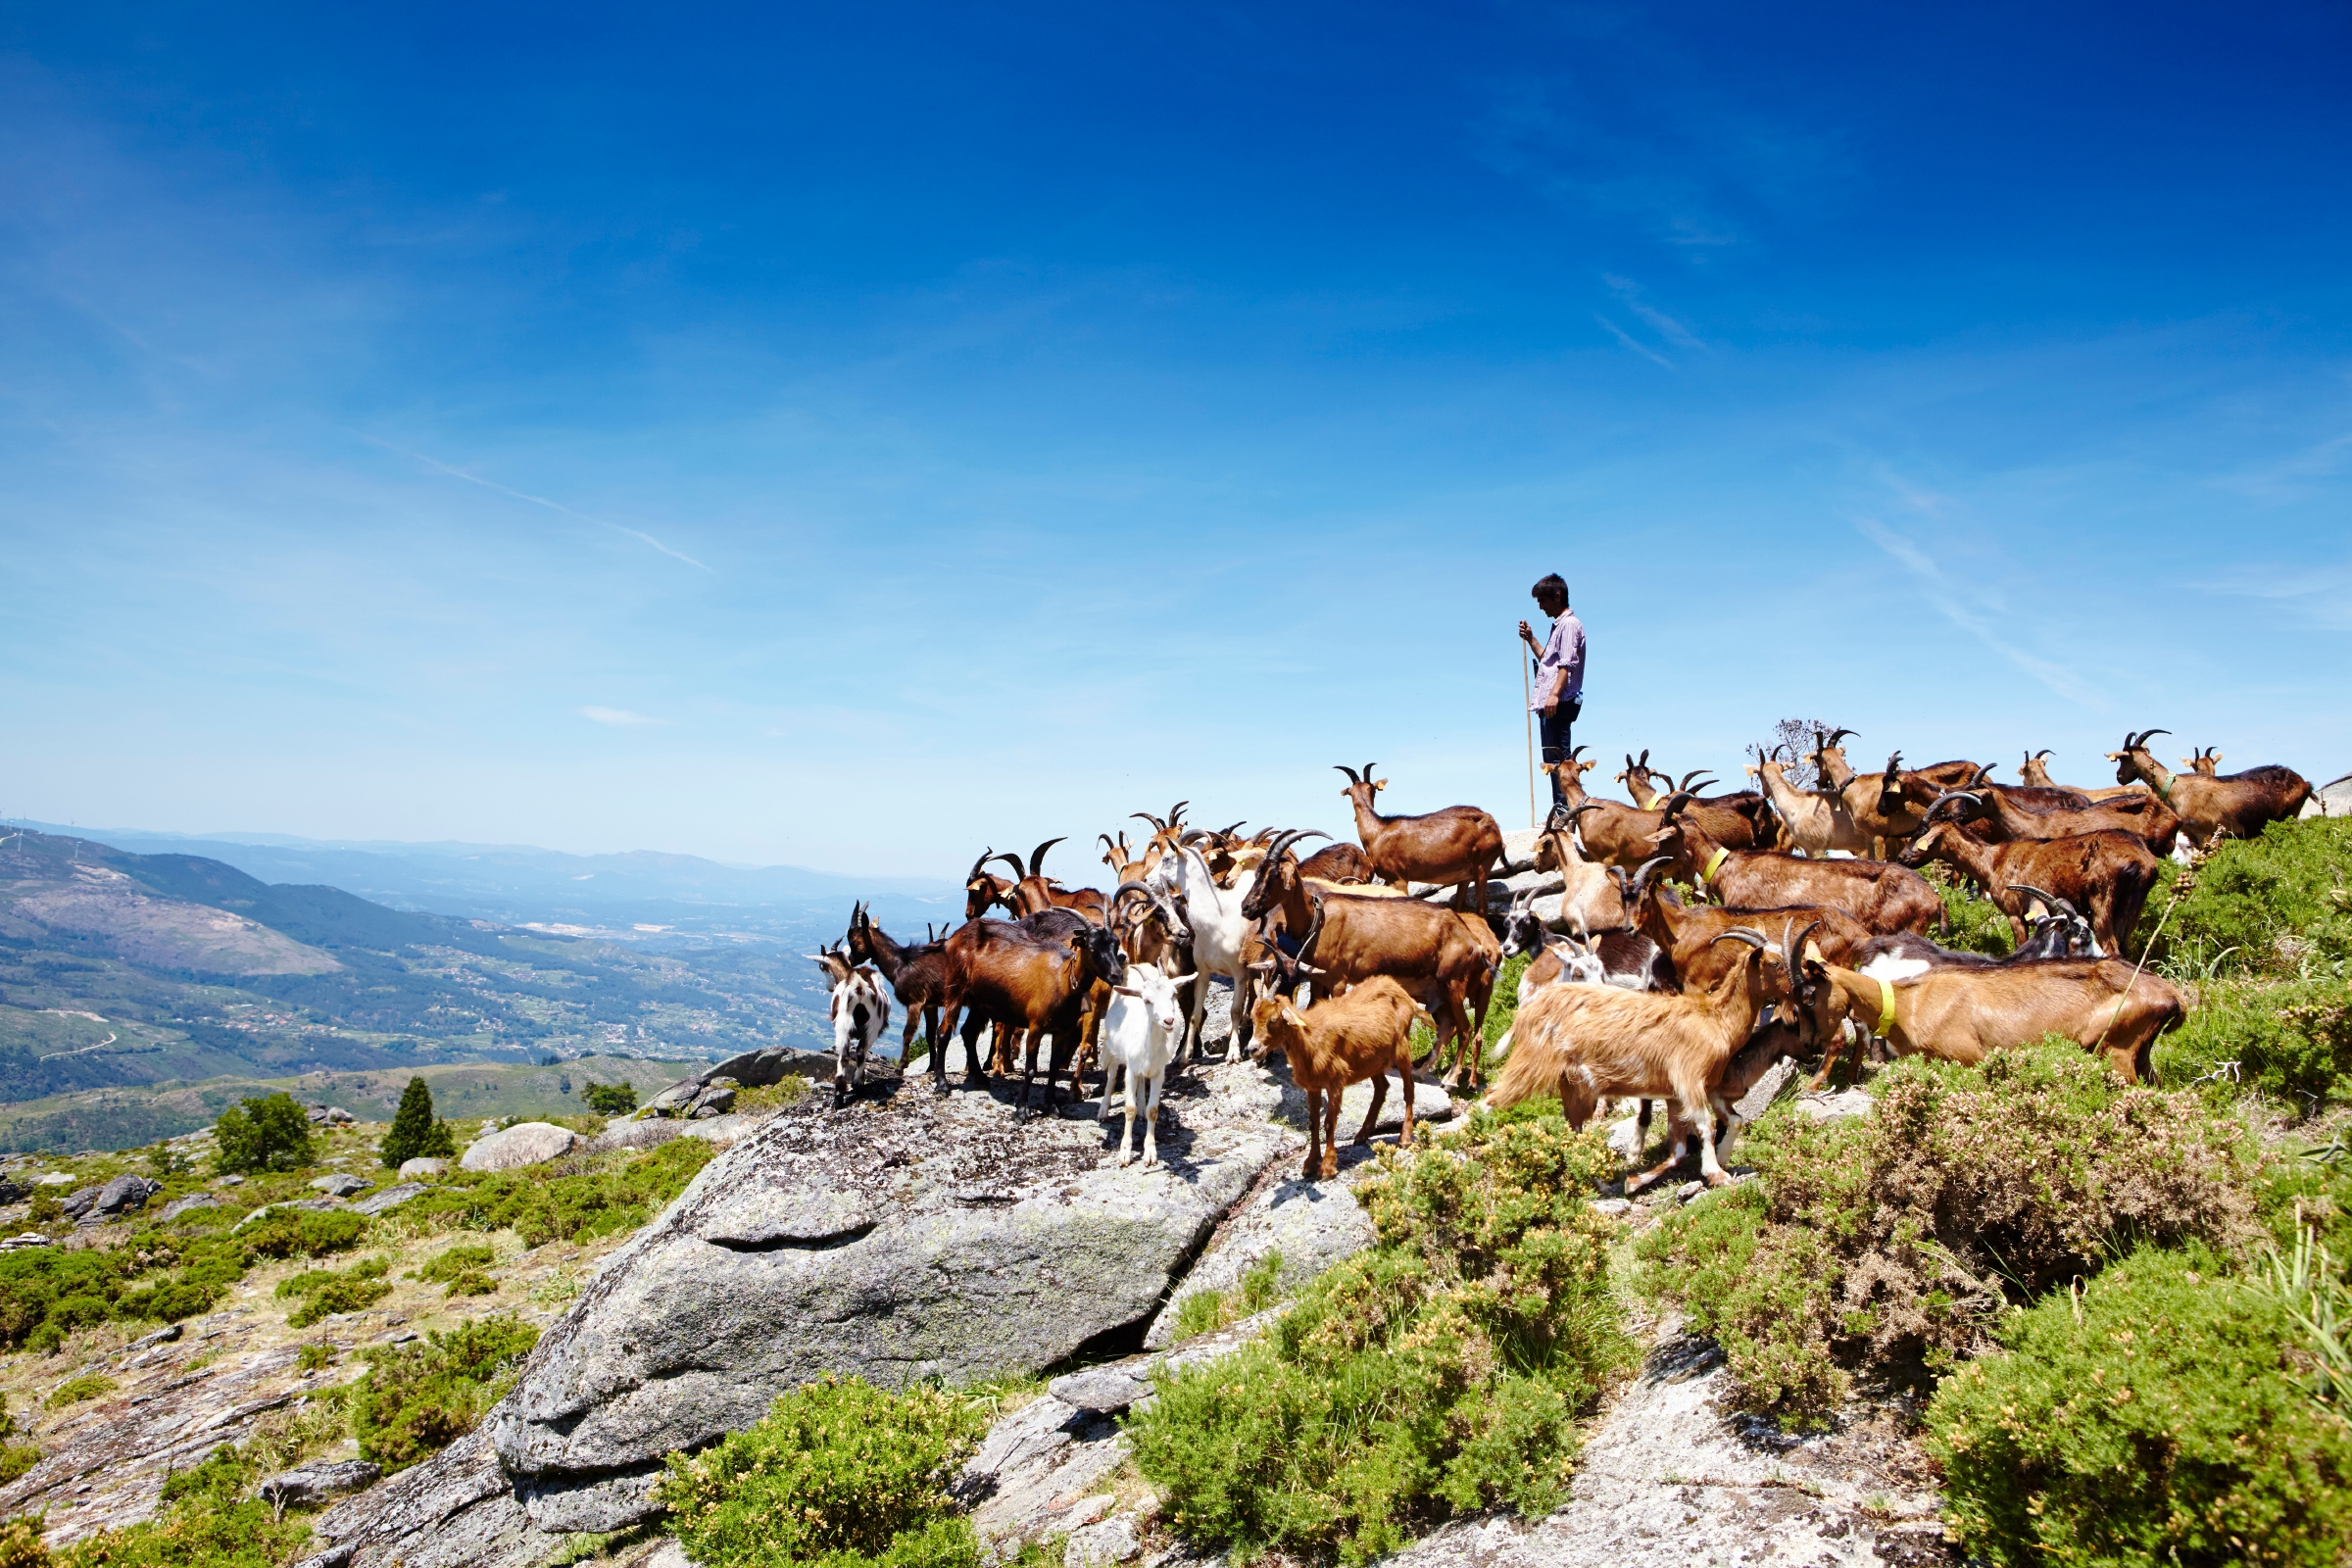 A goat herder takes the high ground in the Parque Nacional da Peneda-Gerês.